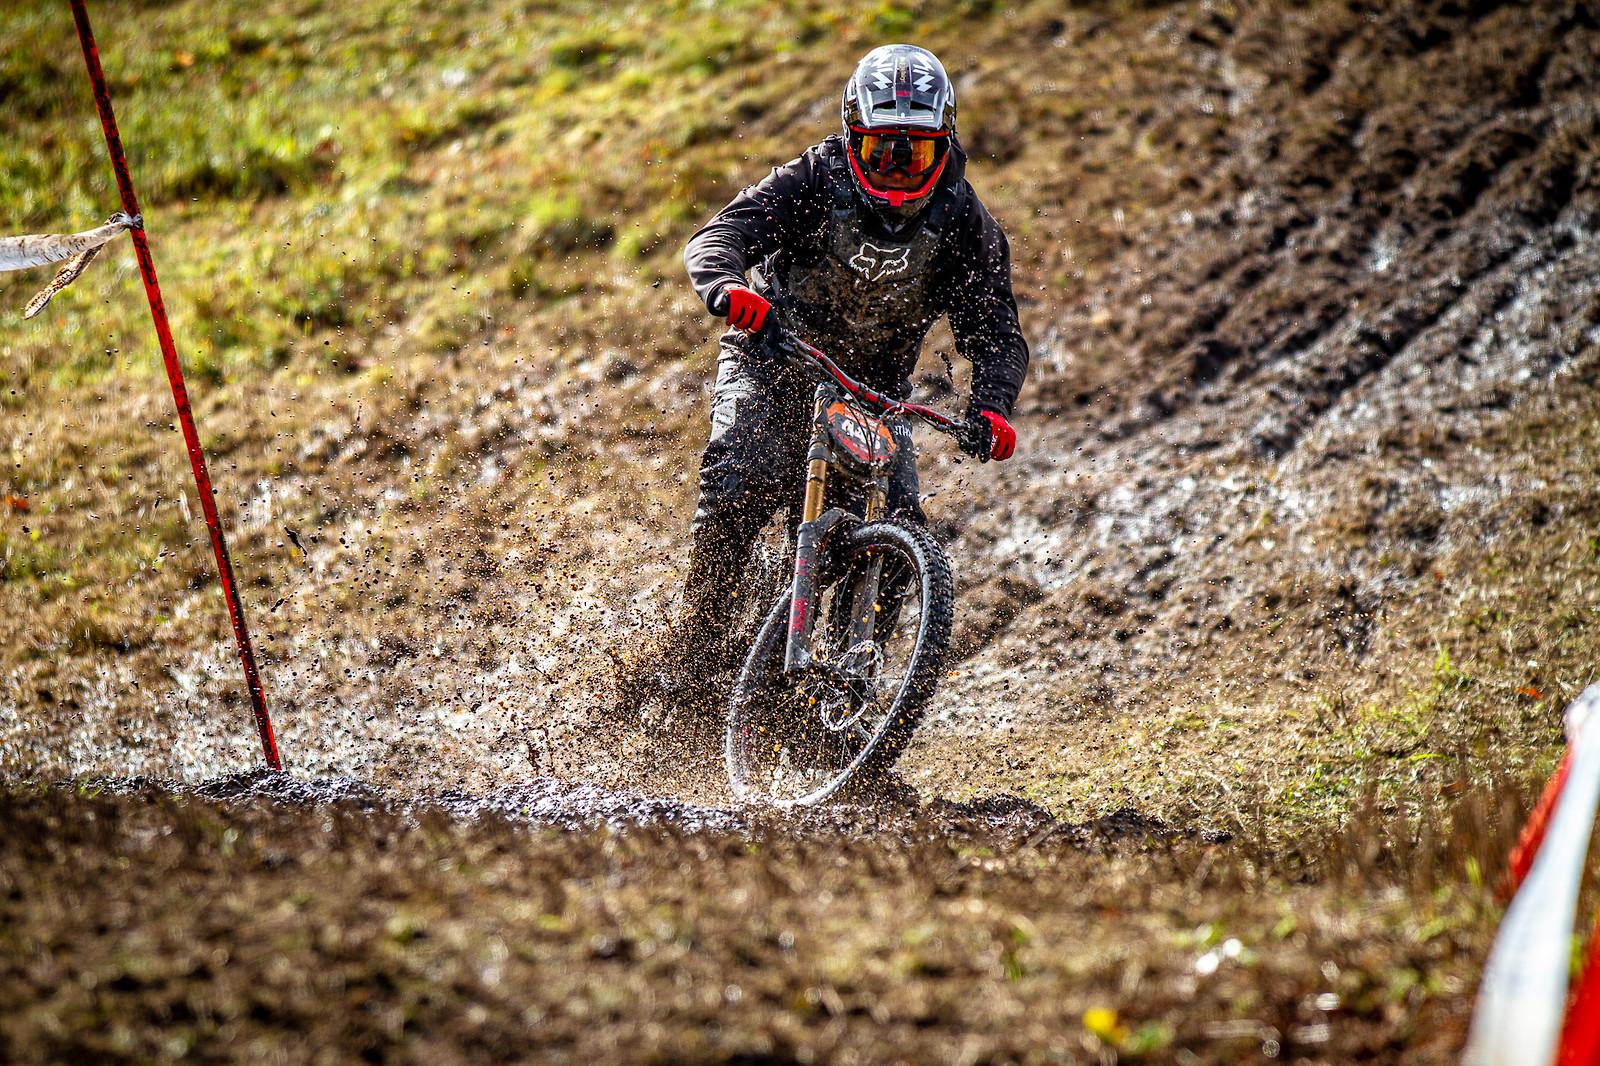 Scott Surdyke - JackRice - Mountain Biking Pictures - Vital MTB